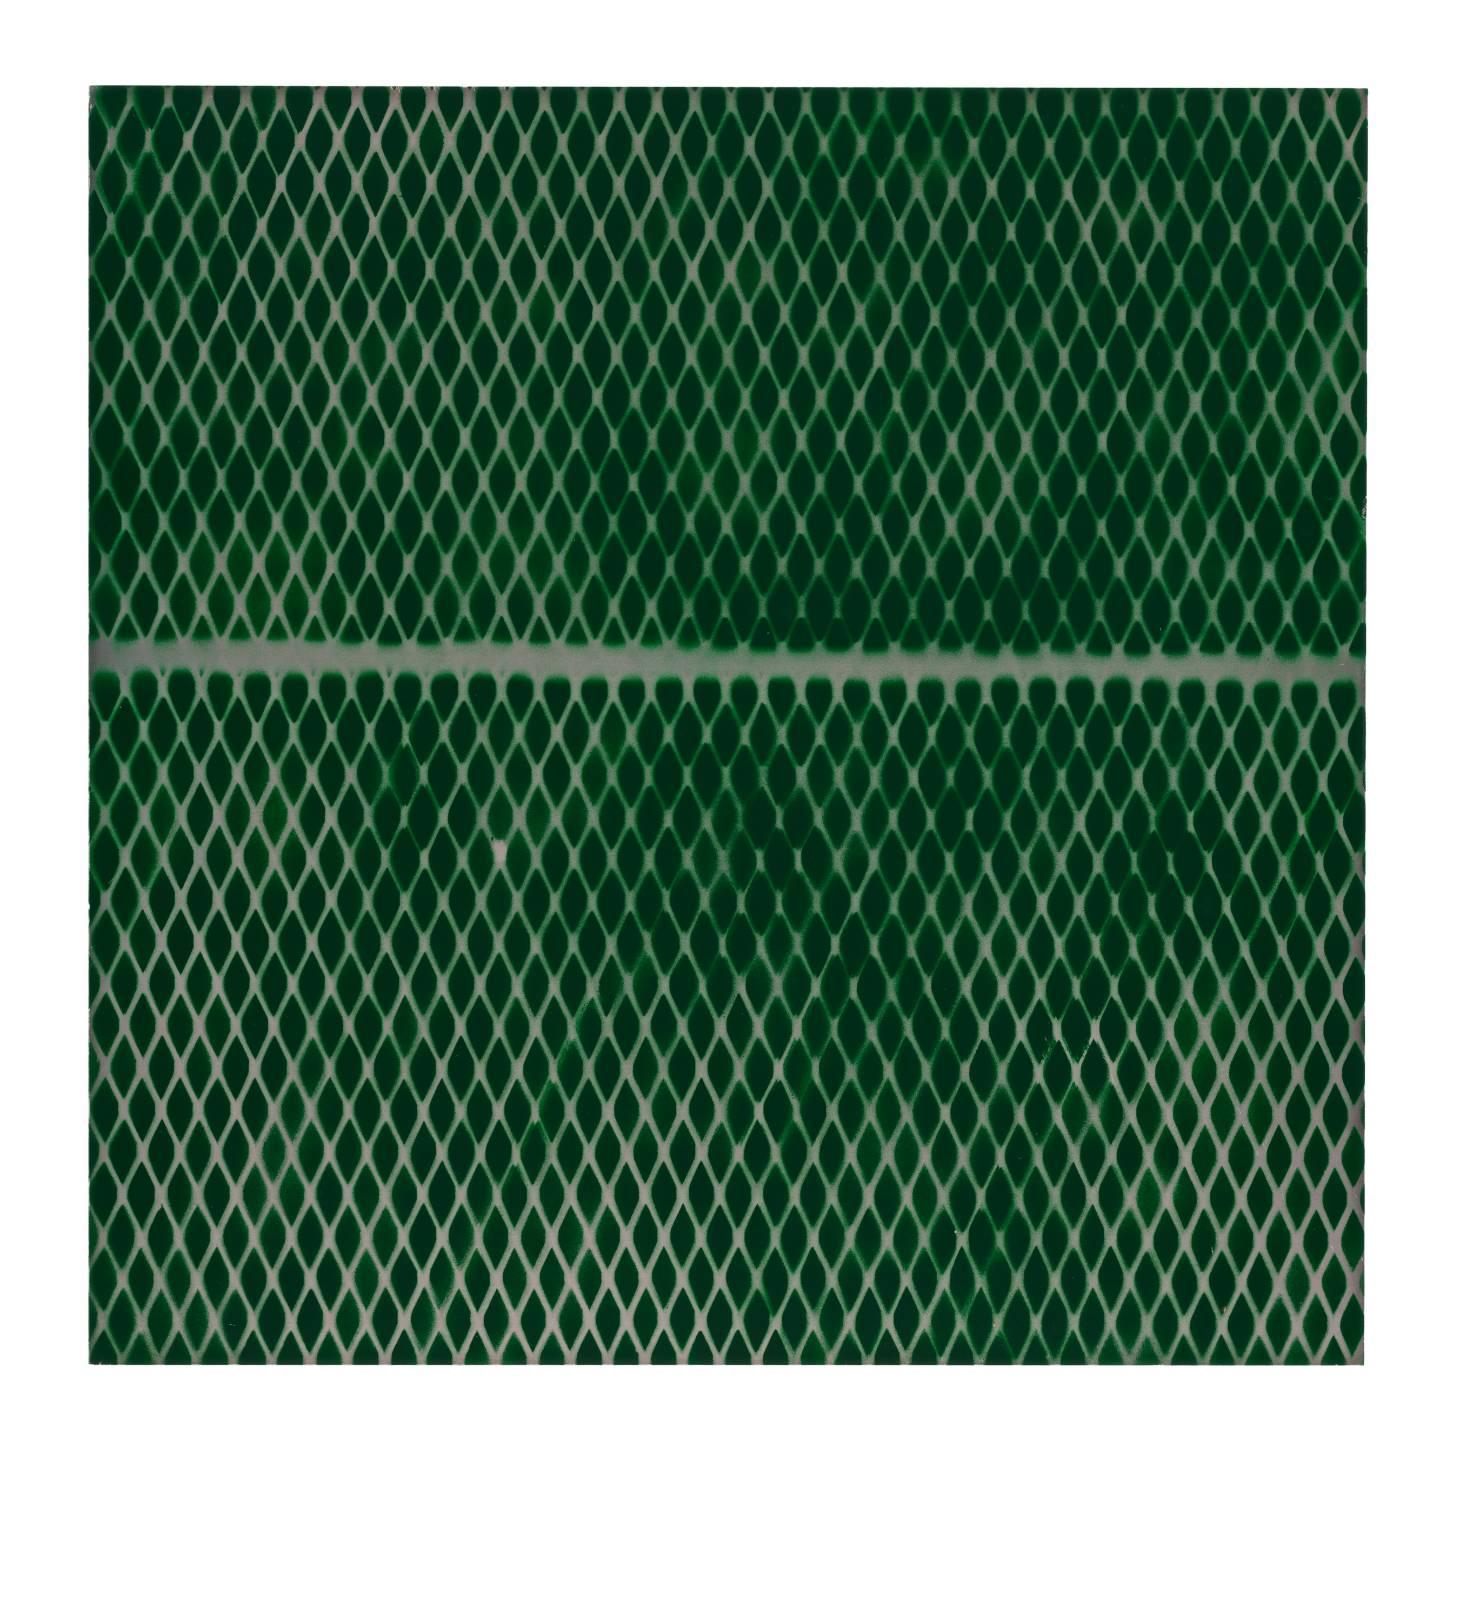 "STAIN : 40°42'43.9""N 73°56'14.6""W, 2015, spraypaint on aluminium, 81,3 x 81,3 cm"